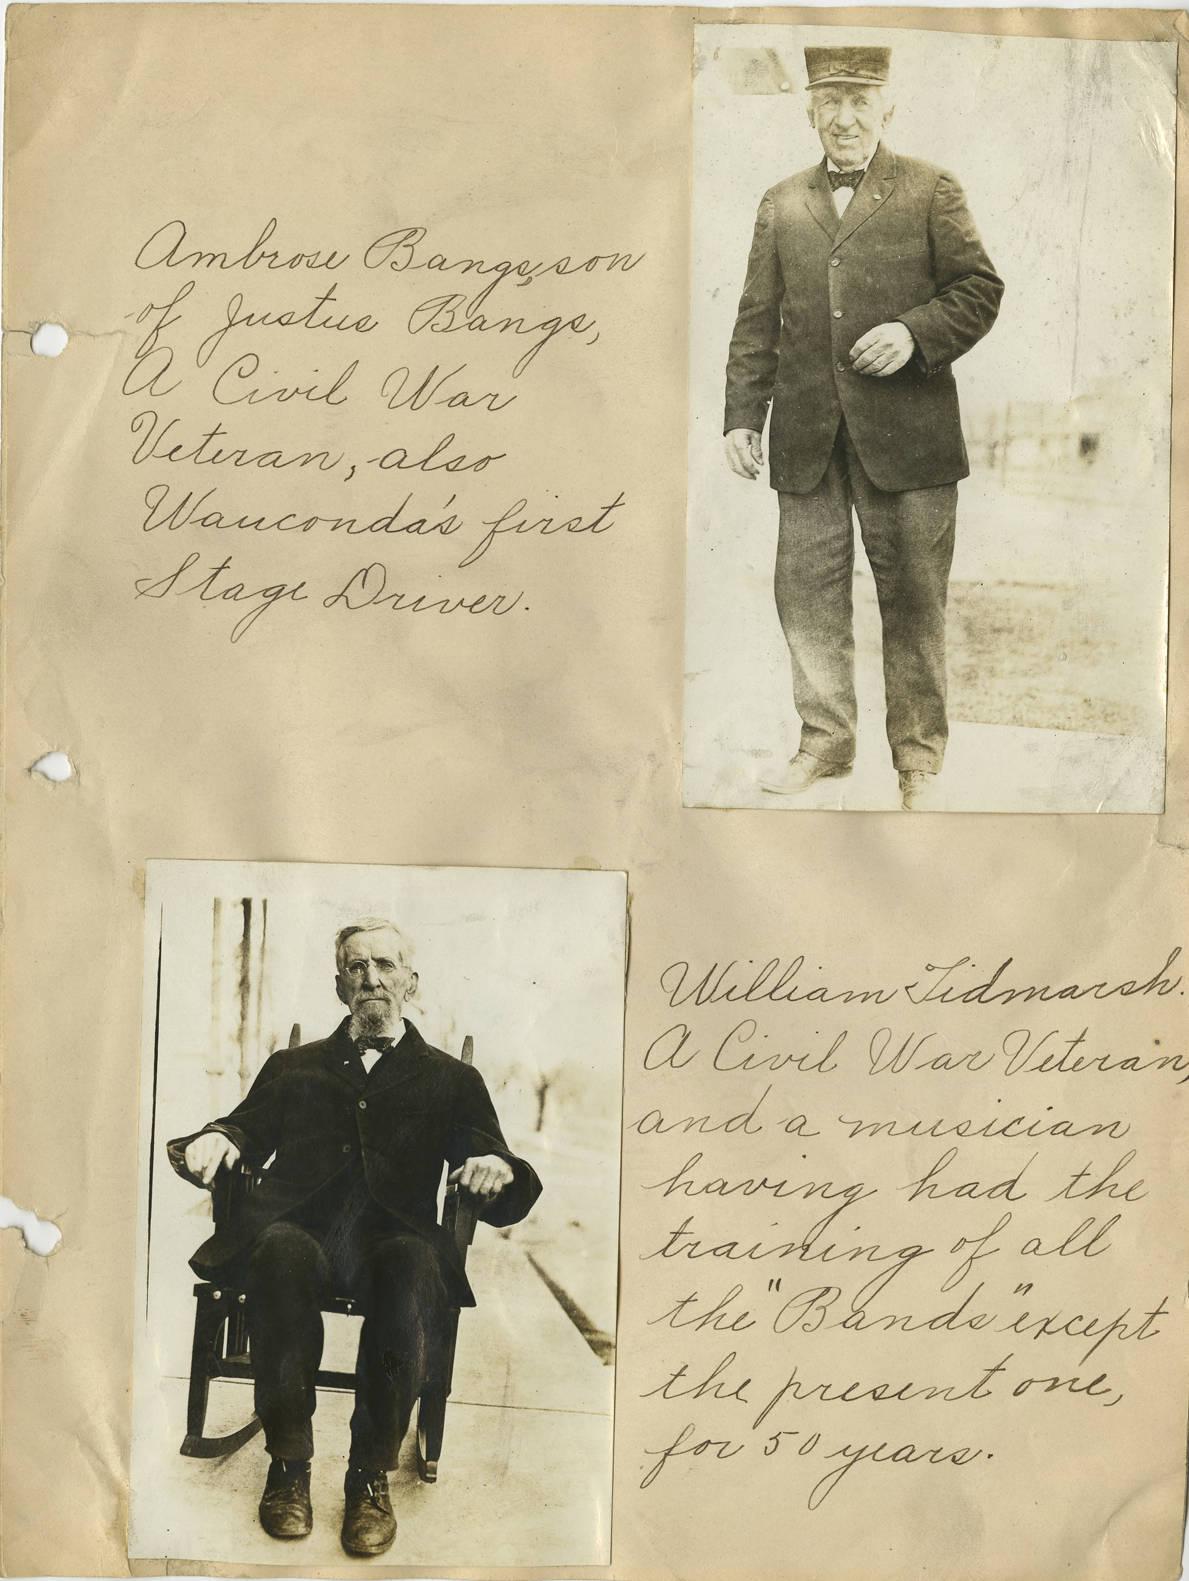 C:\Users\Vern\Documents\Fort Hill\1918 Schools Centennial\1918 Wauconda Twp Wauconda School\1918_School_Histories__Wauconda_Township__Wauconda_School_2003046_Page_55.jpg